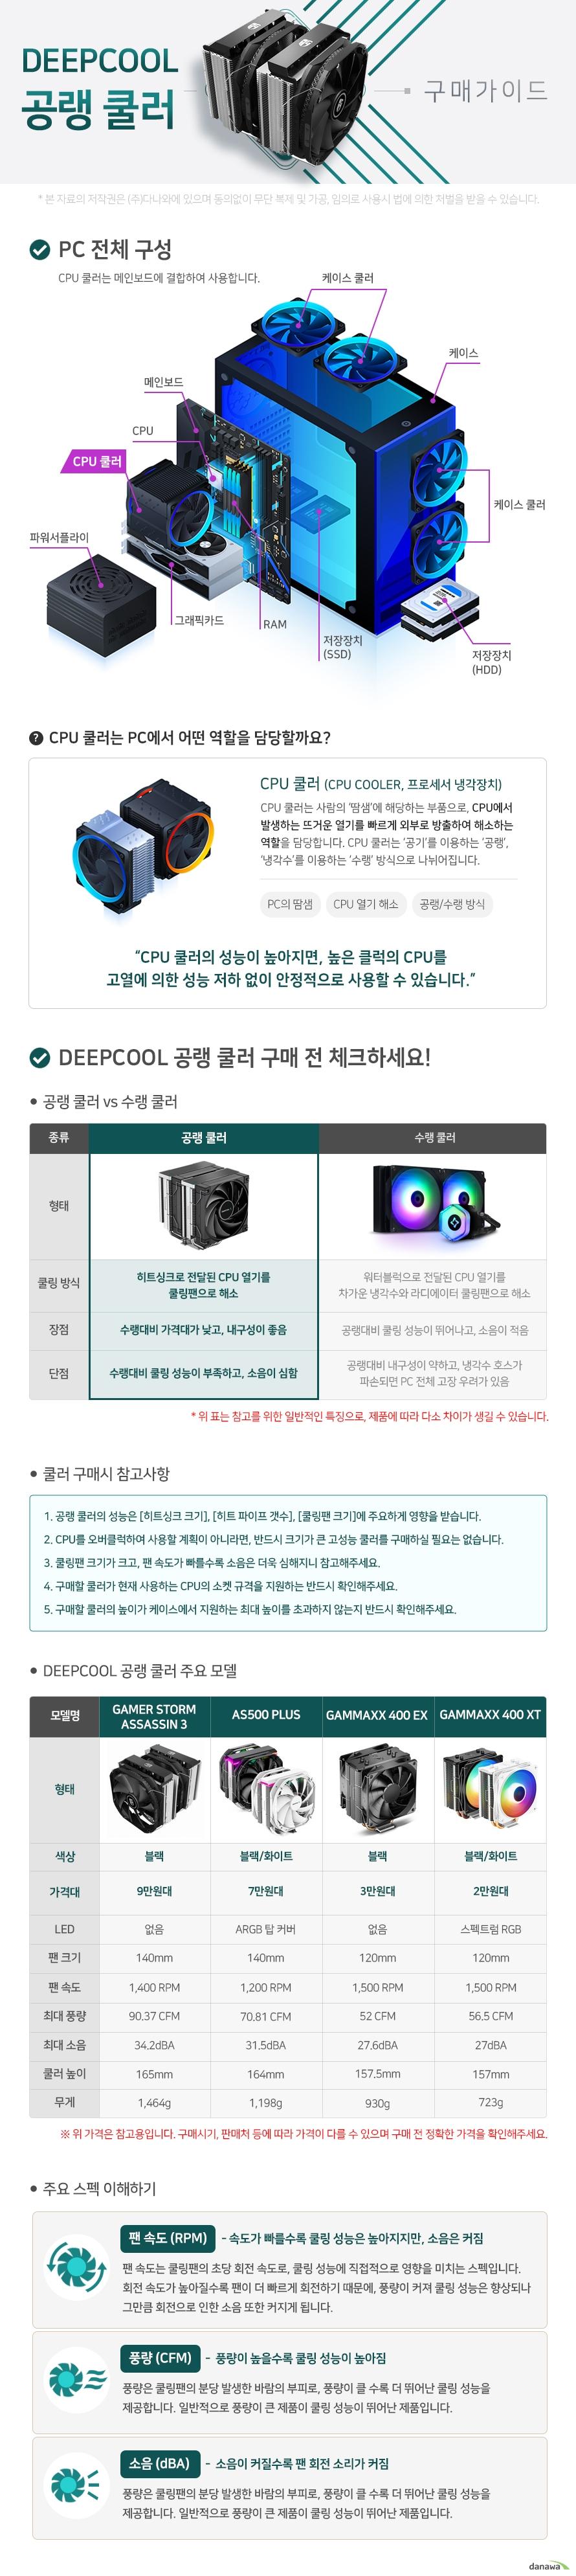 DEEPCOOL UL551 ARGB